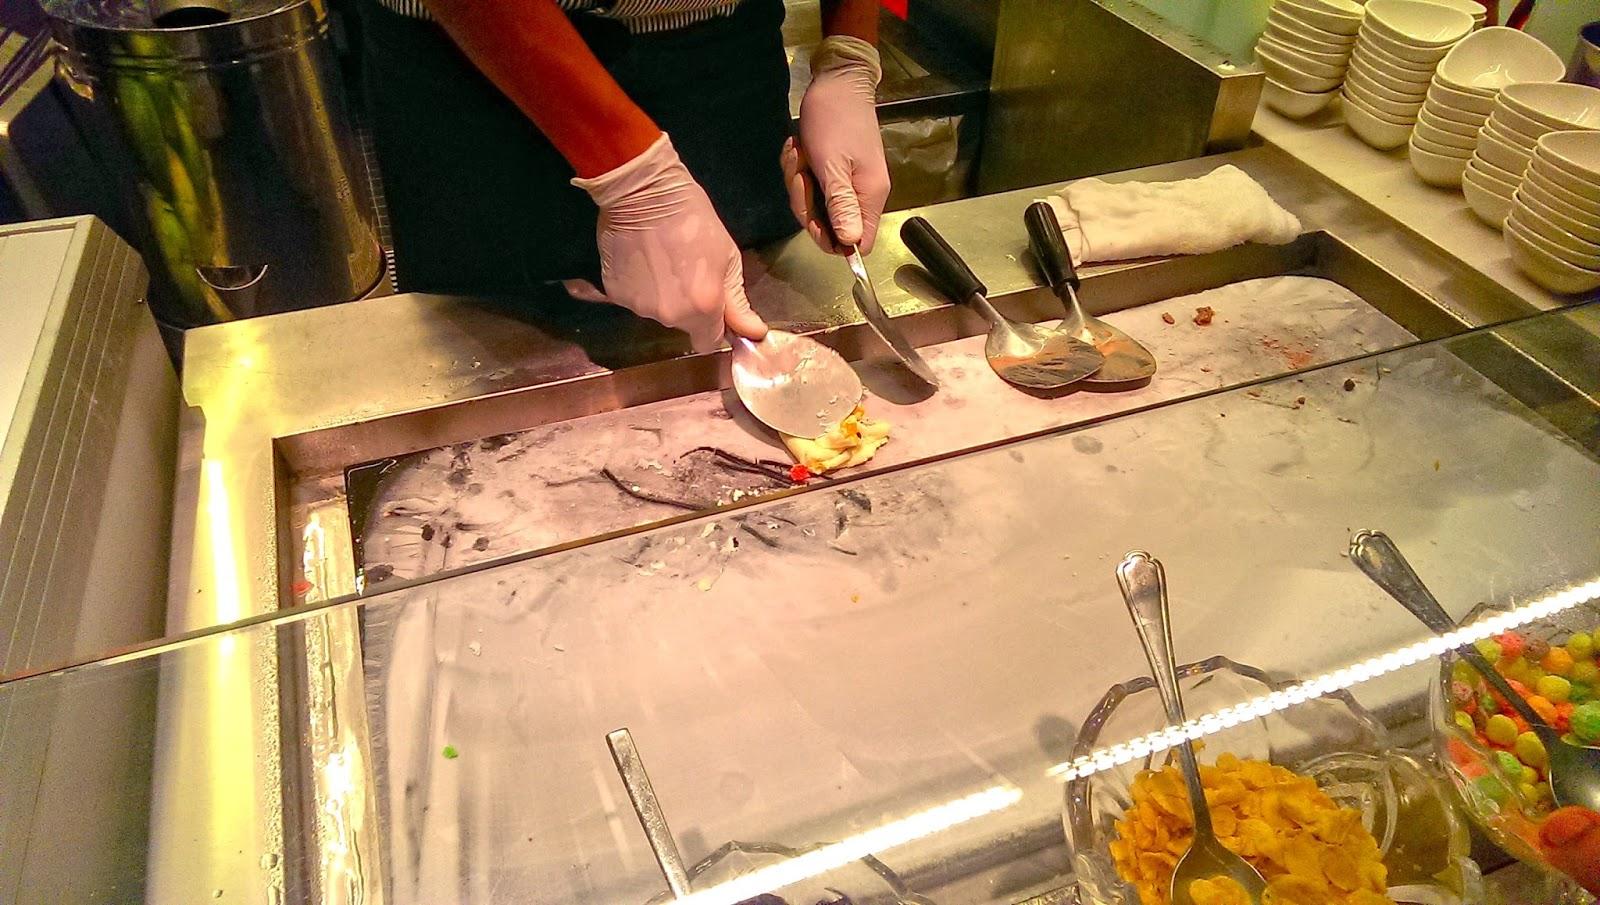 2015 07 01%2B19.06.31 - [食記] 台北京站 - 饗食天堂,有生魚片吃到飽的高級自助餐廳!